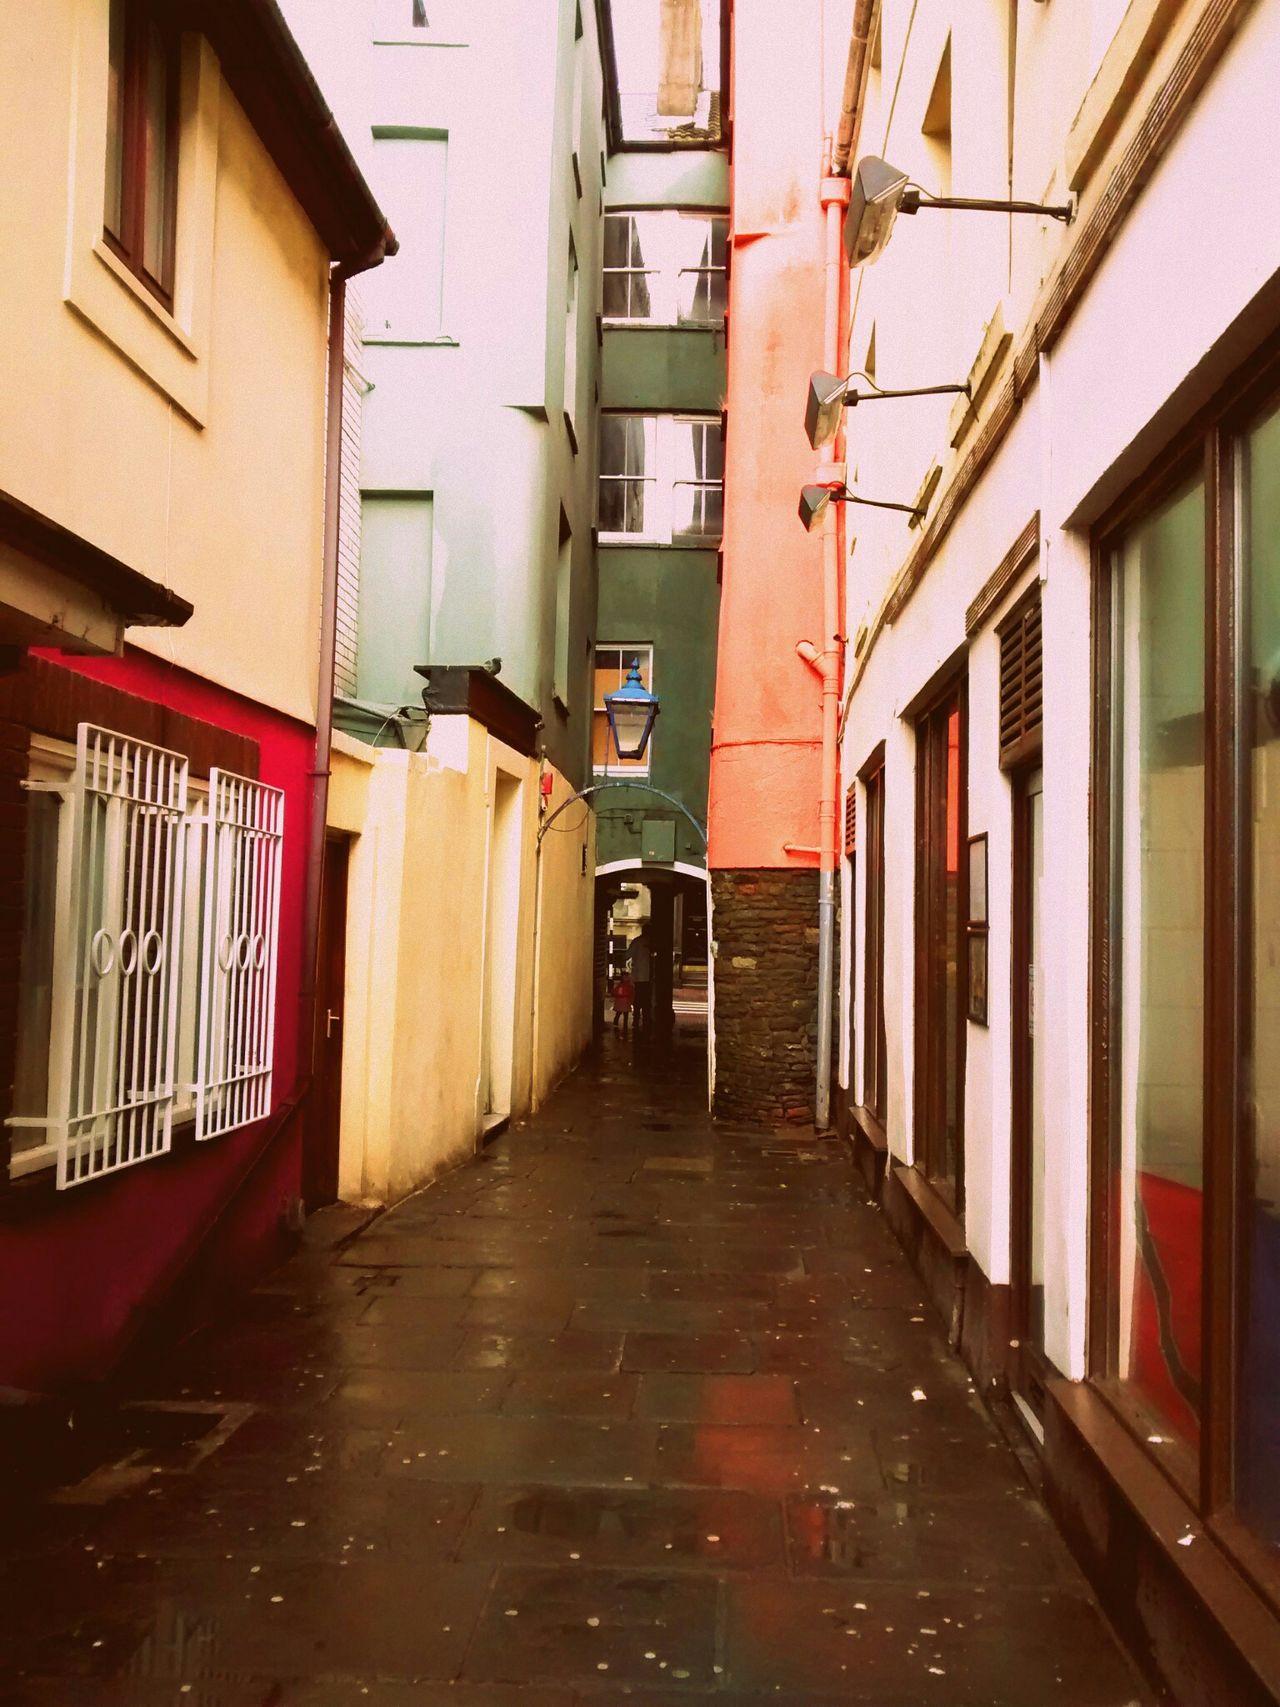 Urbanphotography Urban Landscape Alleys Walking Around Taking Photos Paths